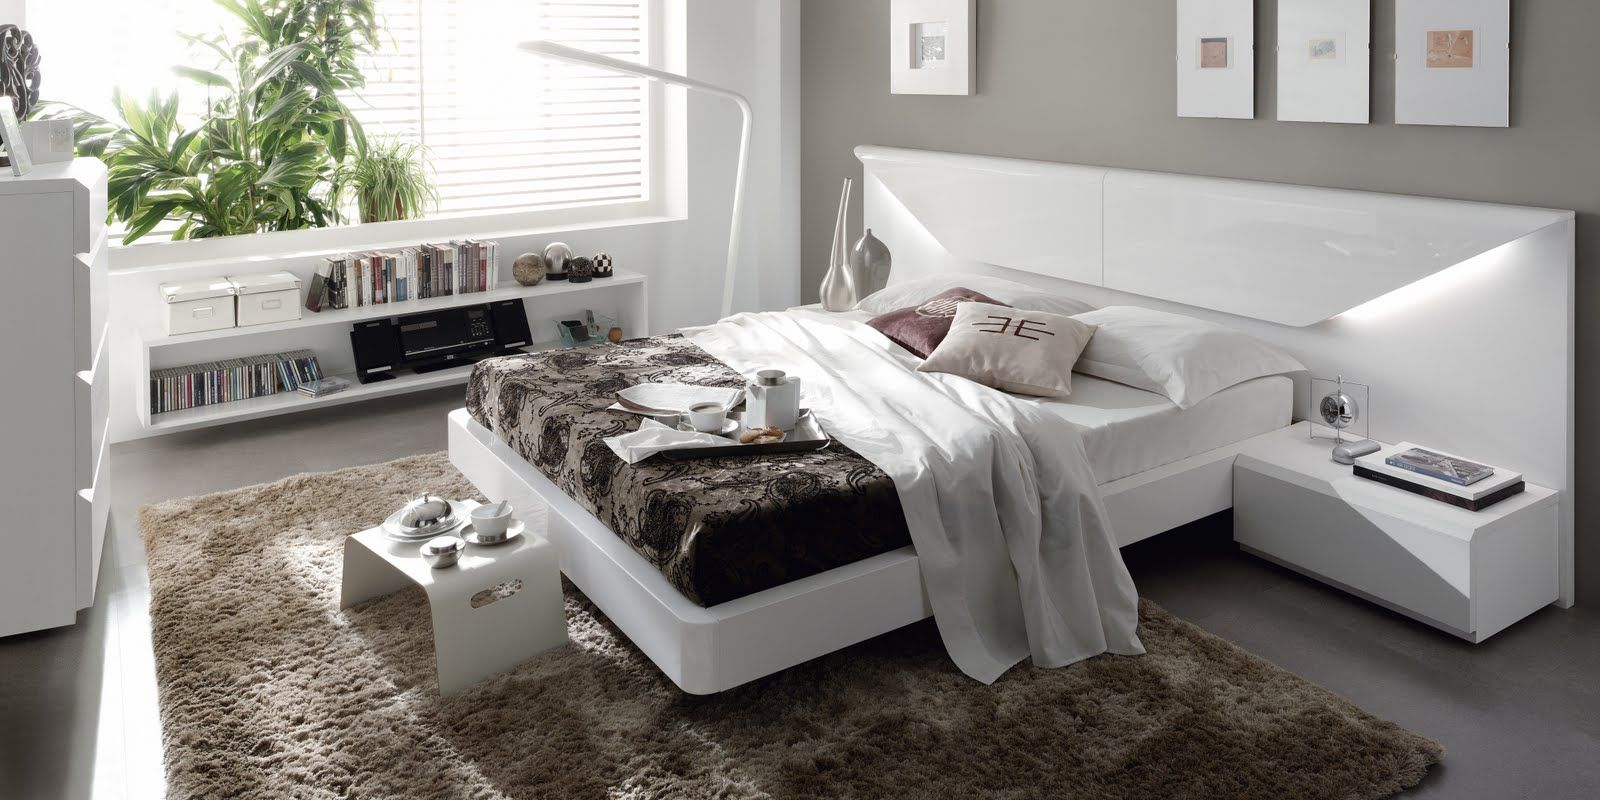 dormitorio de matrimonio lacado blanco mila | 2018 | Pinterest ...